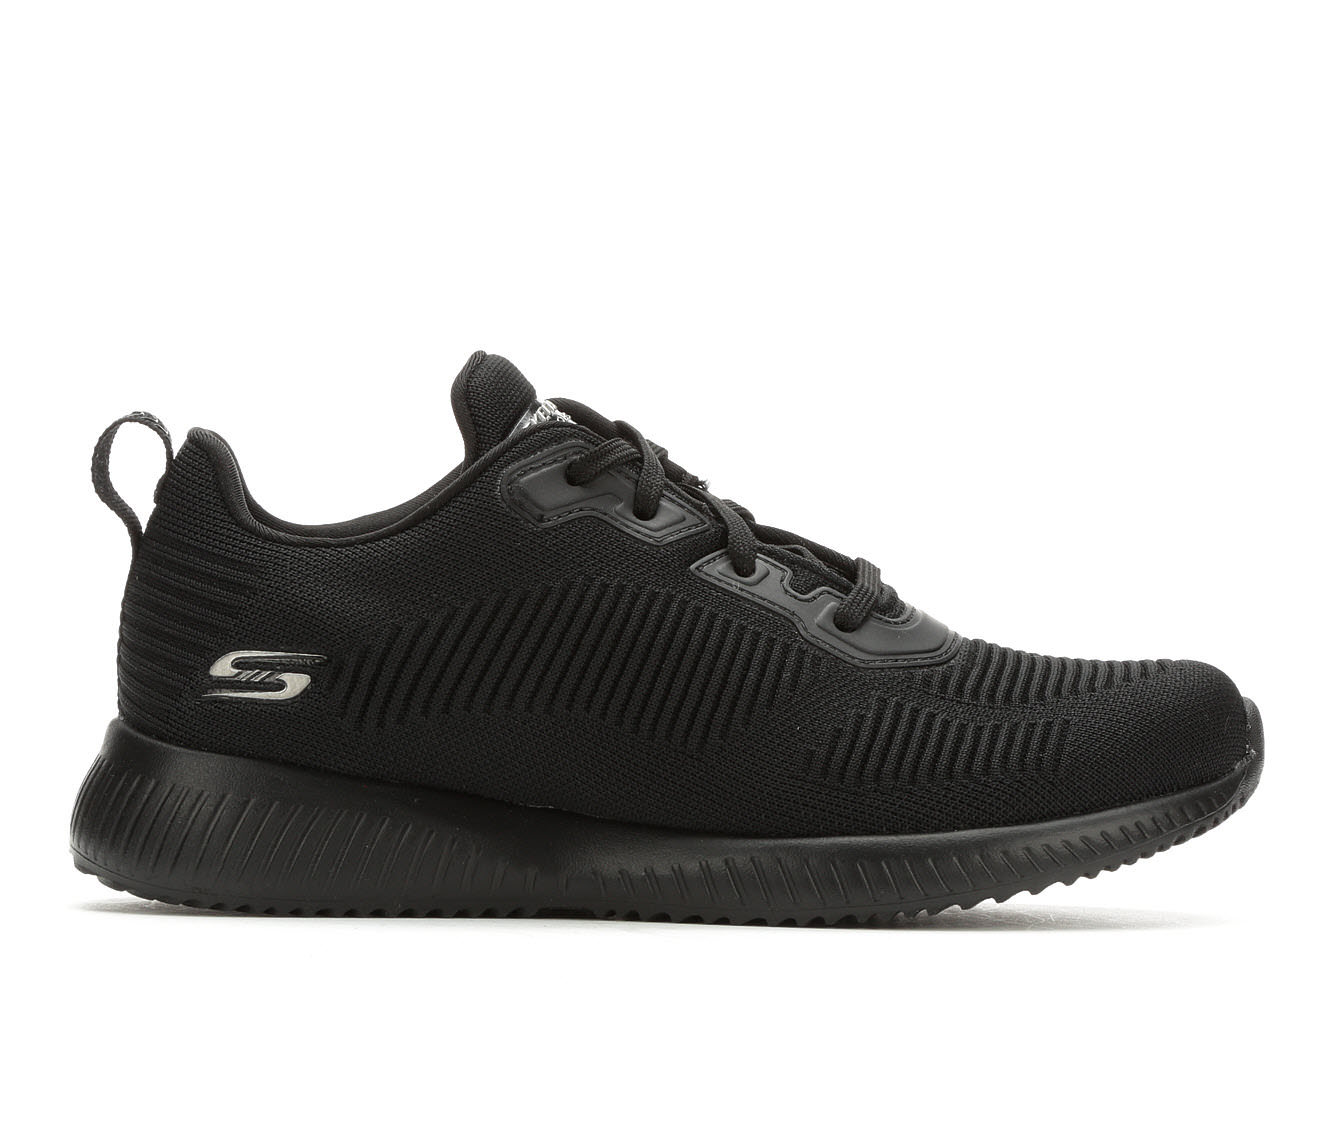 Skechers BOBS Tough Talk 32504 Women's Athletic Shoe (Black)